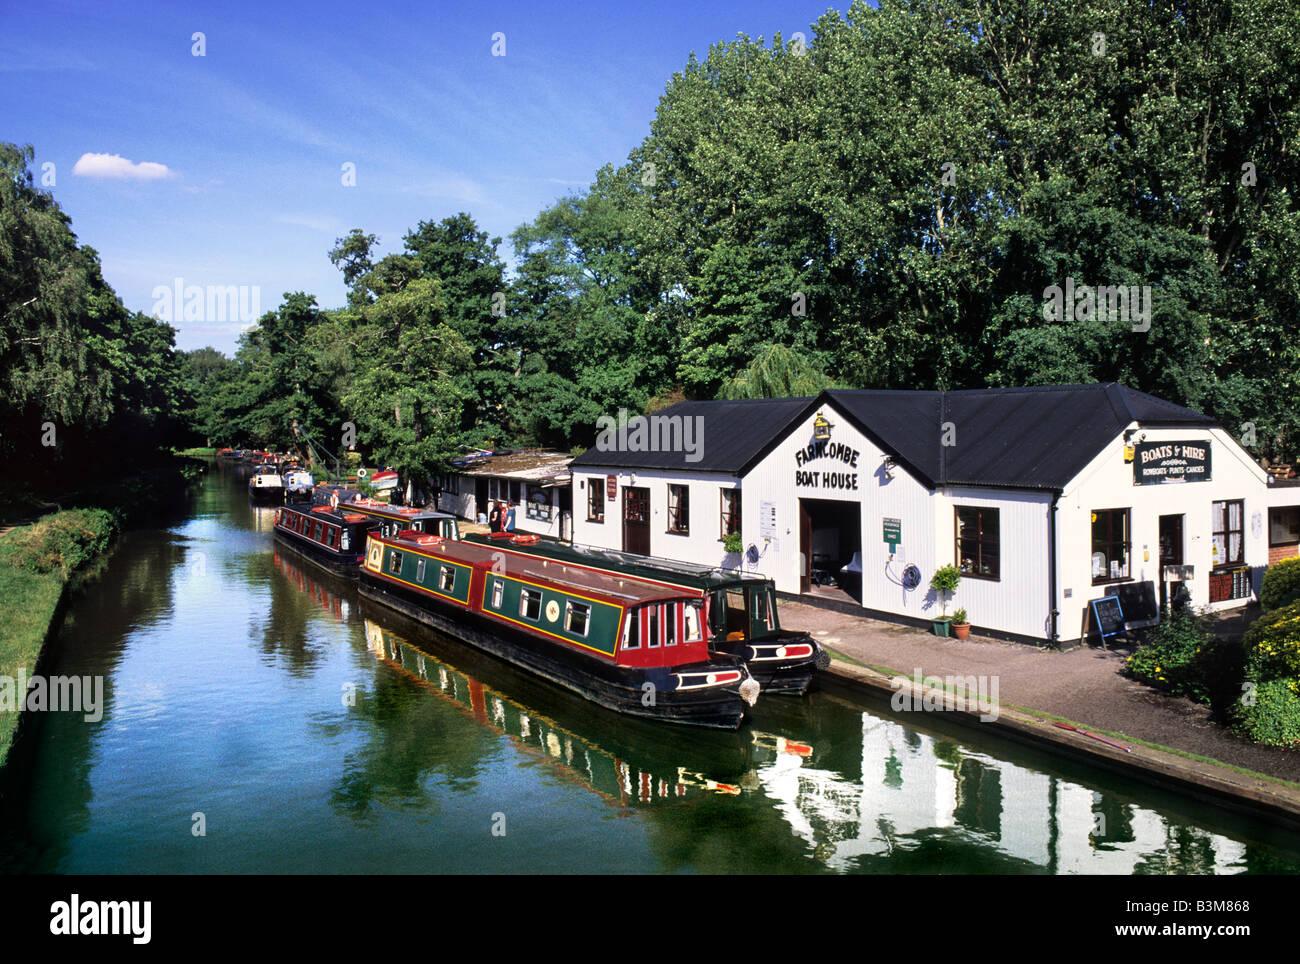 Narrow boats moored at Farncombe Boathouse, River Wey Navigation, near Godalming Surrey - Stock Image